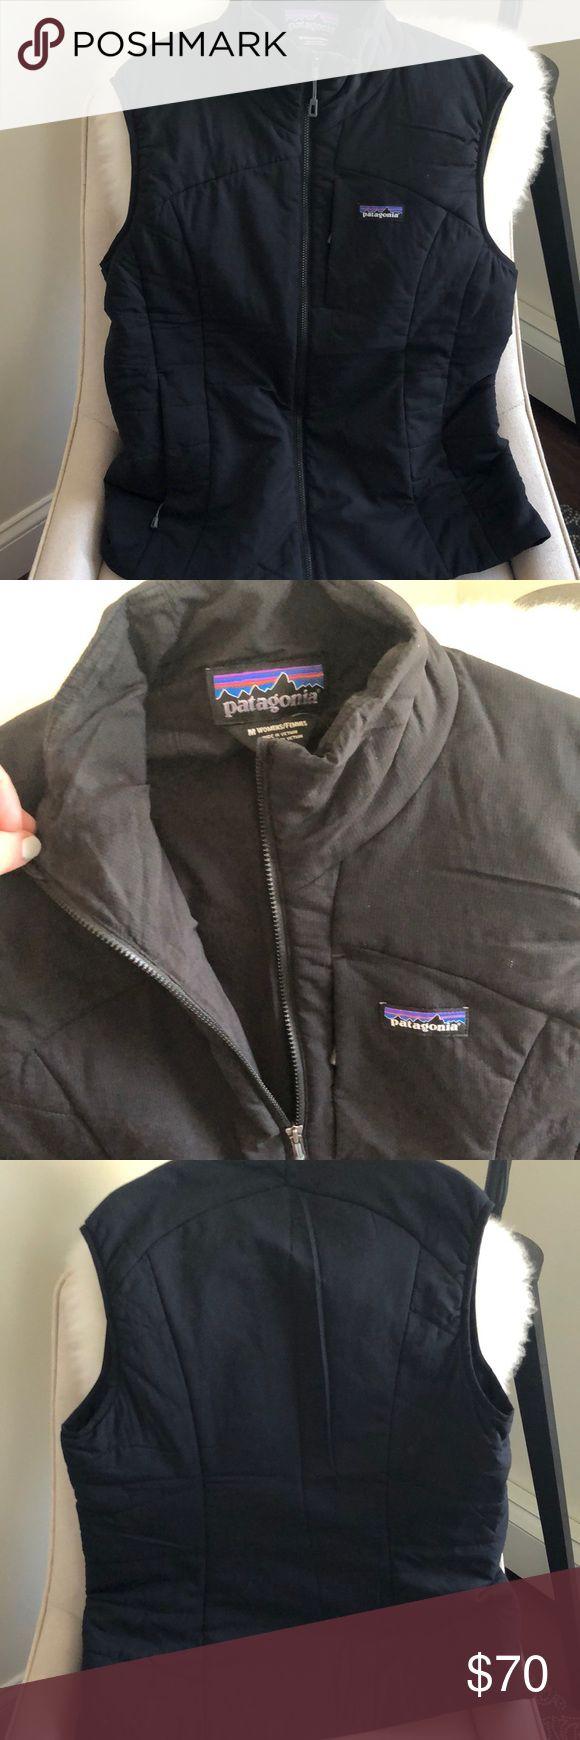 Like new Patagonia nano air vest Patagonia jacket, Like